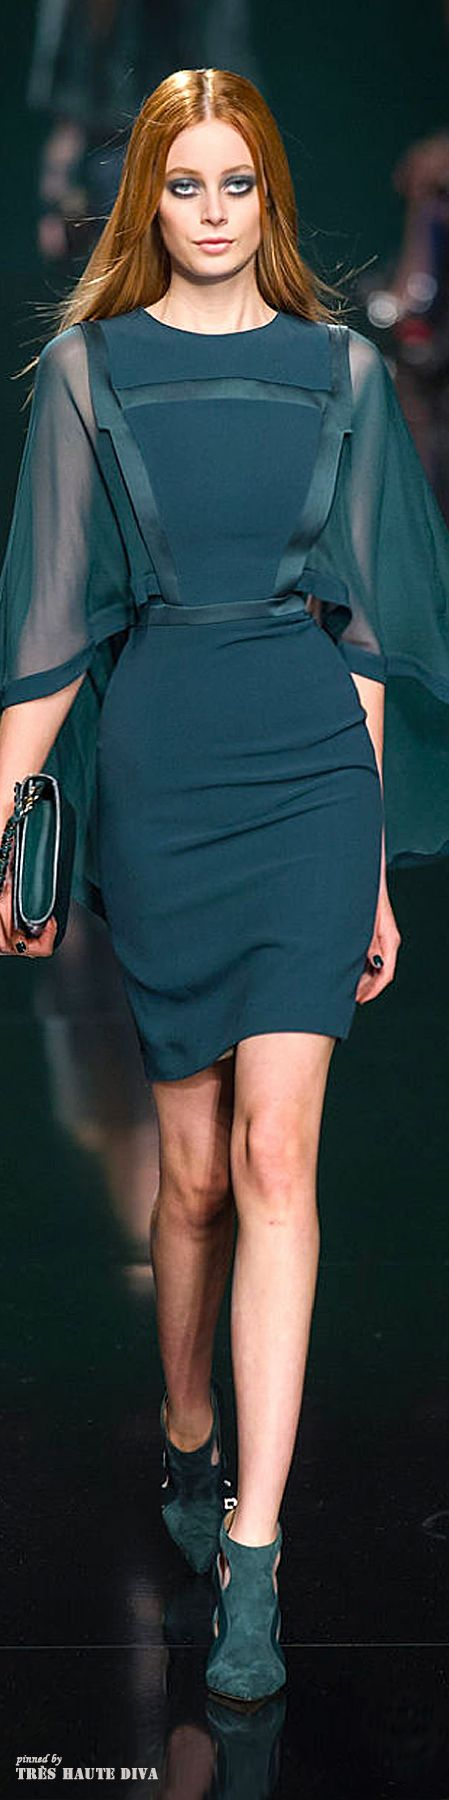 Elie Saab Fall/Winter 2014 RTW - Paris Fashion Week                                                                                                                                                      More